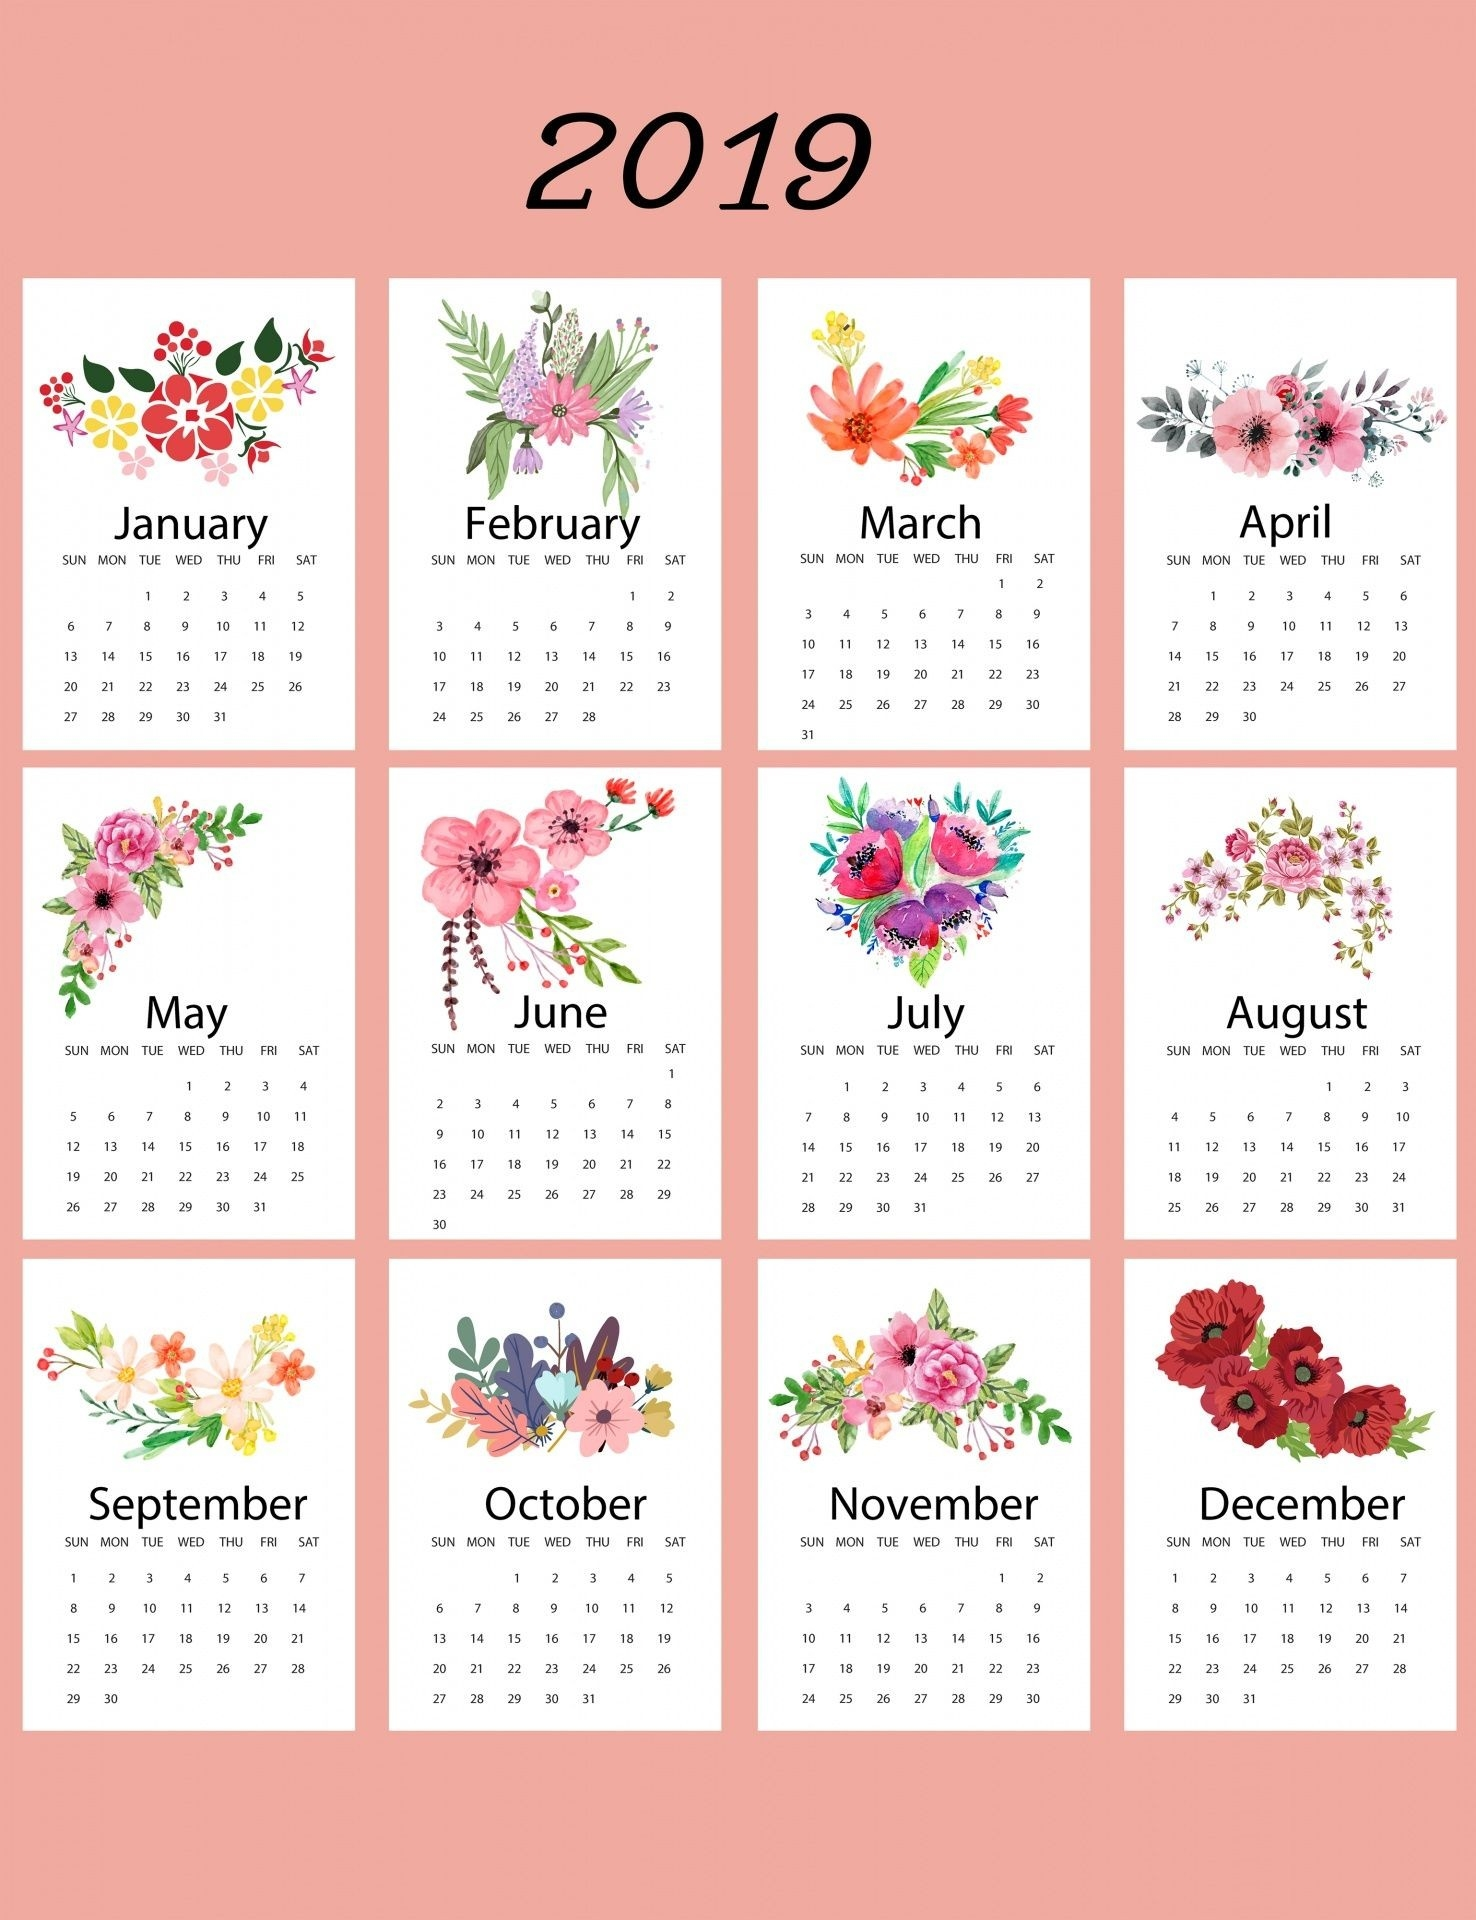 2019 Calendar Floral Template | Calendar 2019 Printable-Template For Calendars With Flowers